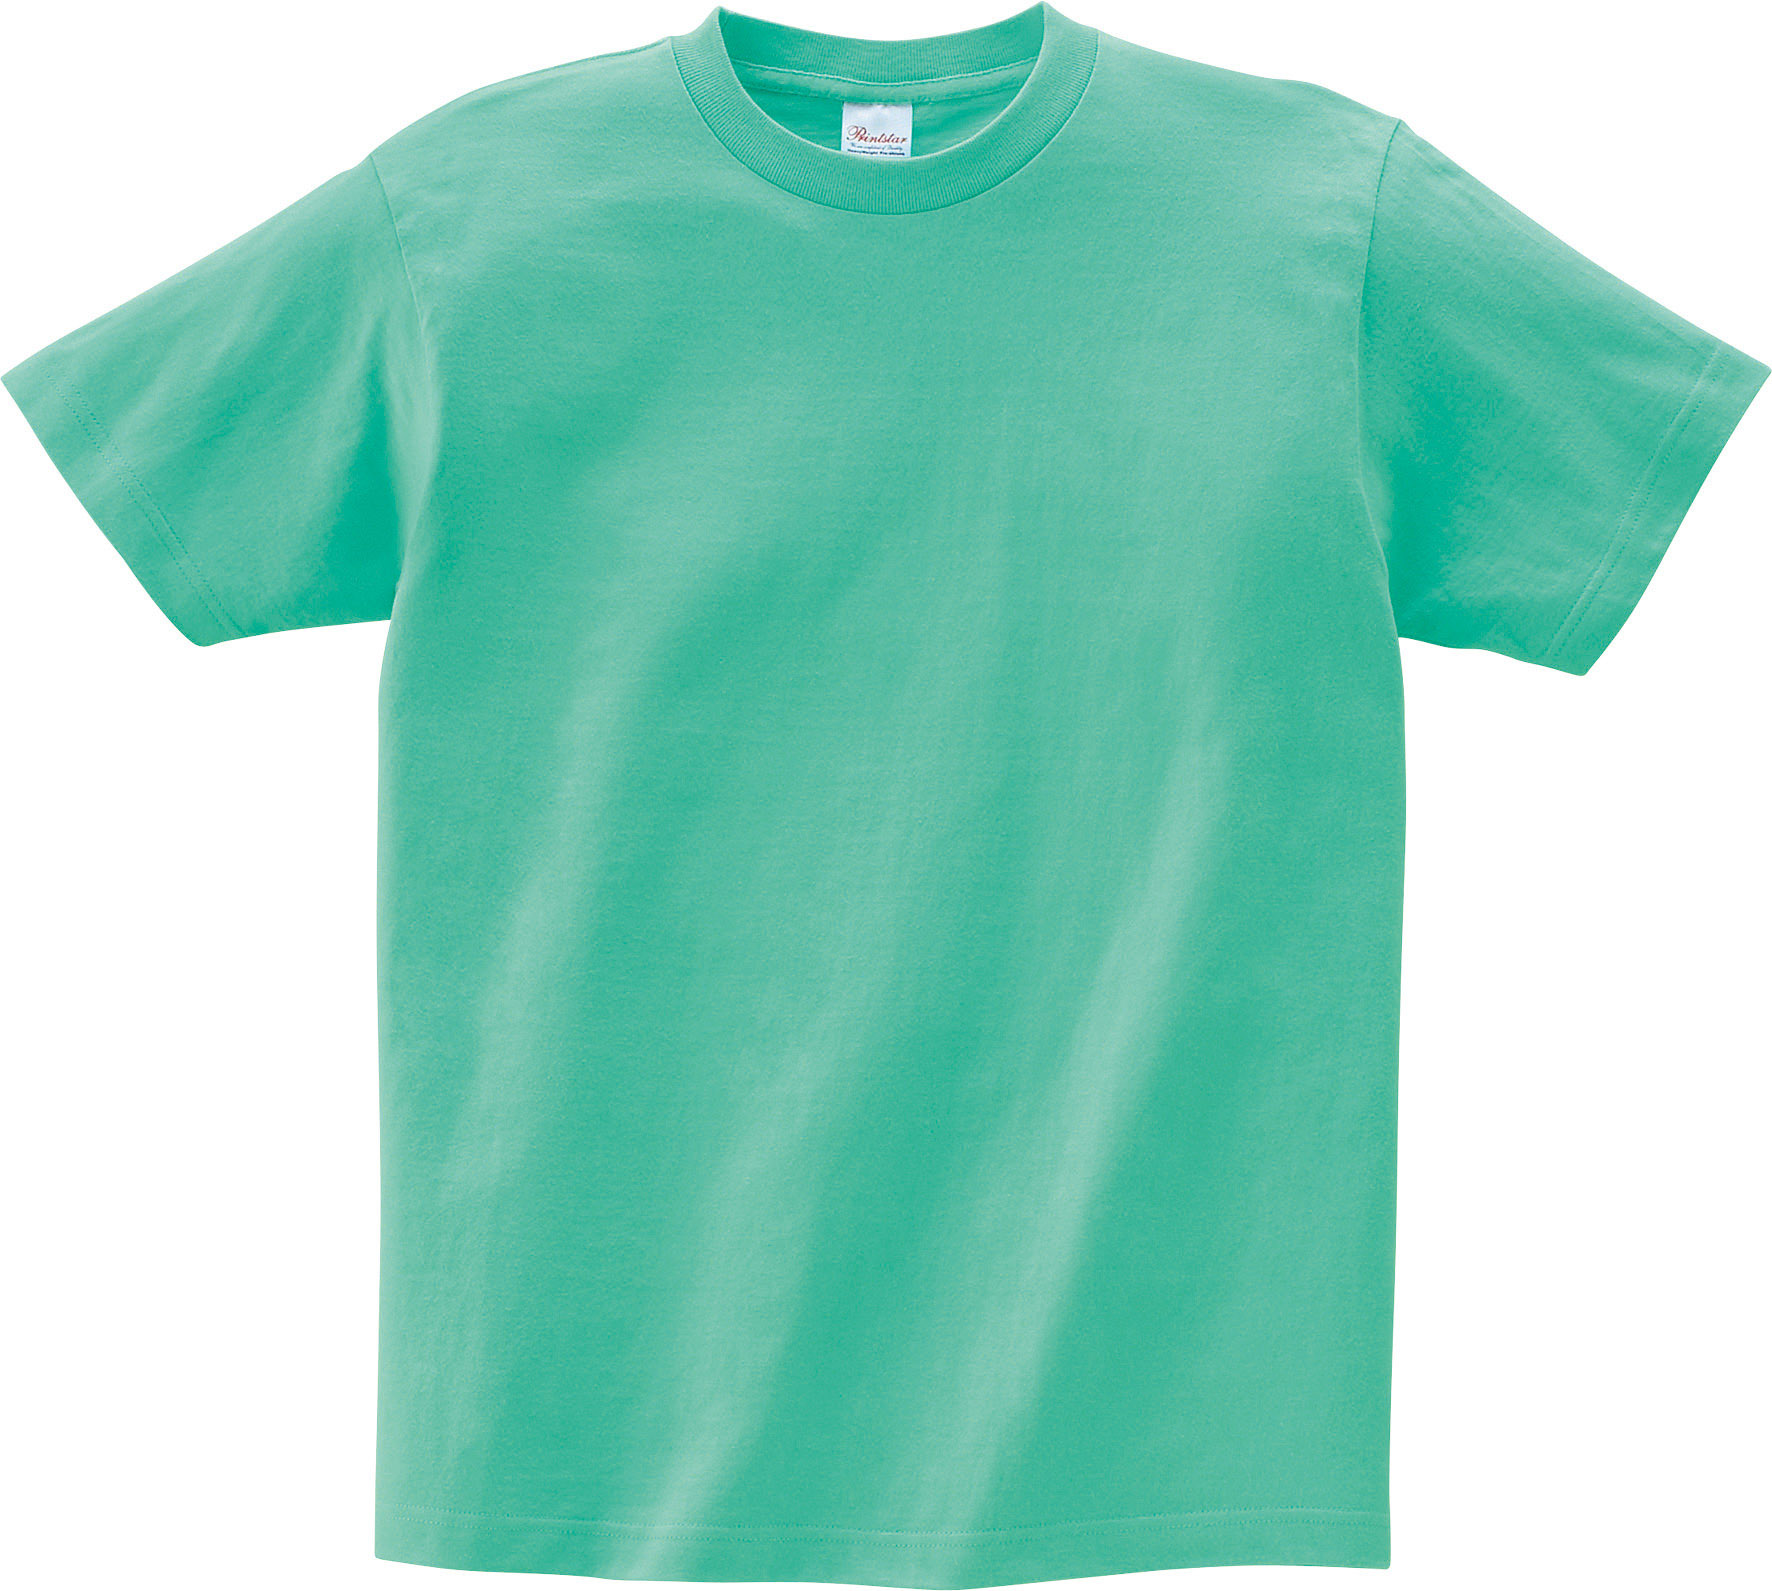 00085-CVT 5.6オンス・ヘビーウェイトTシャツ - 026-ミントグリーン, XXXL